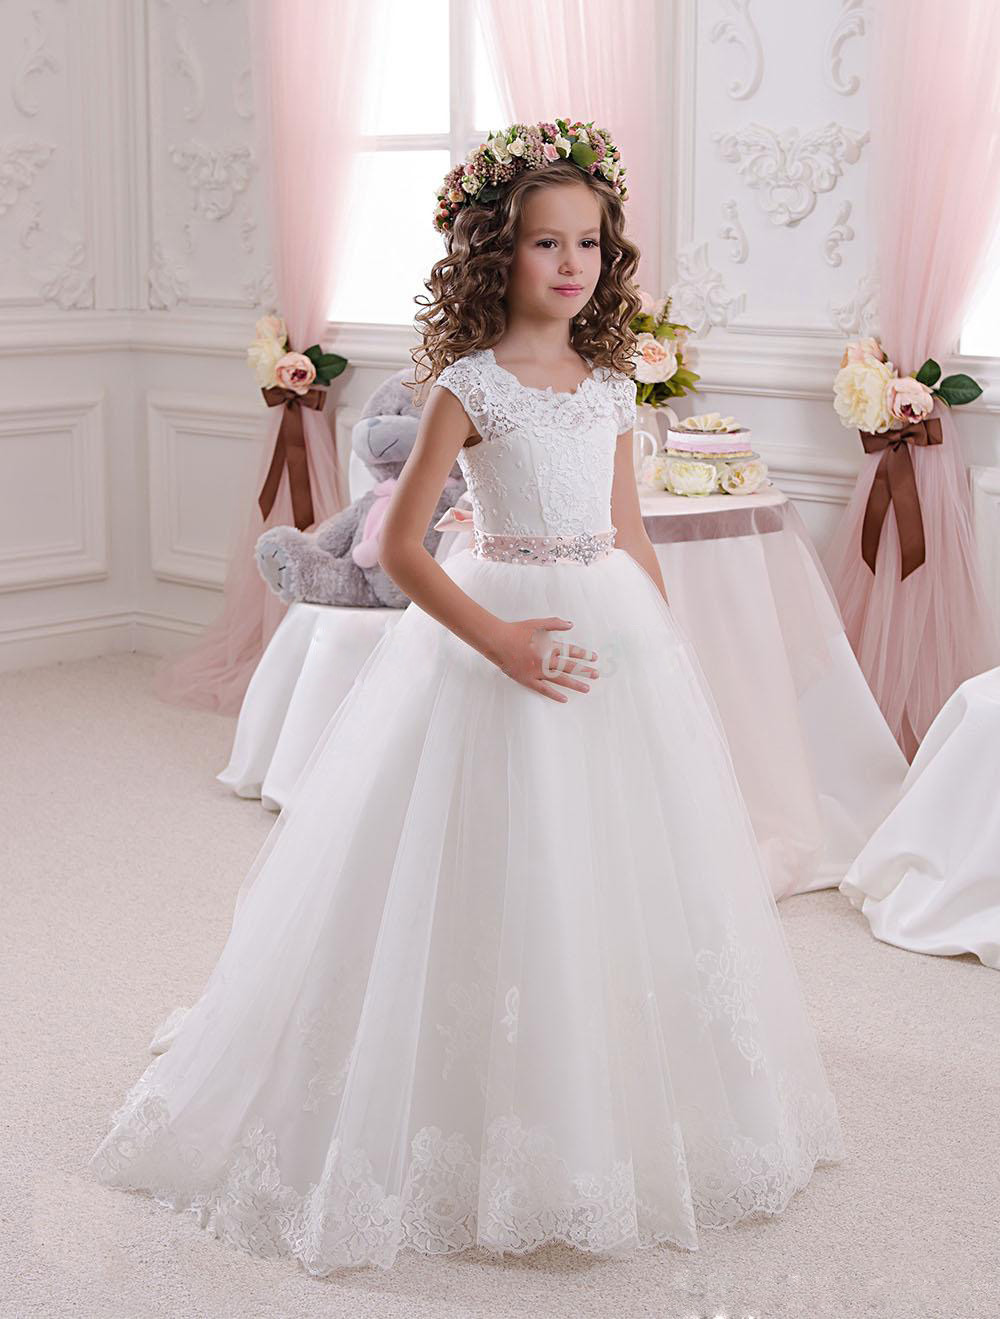 Honey Qiao 2016 Lace Flower Girl Dresses Dresses Ball Gown Long Girls Pageant Weddings First Communion Little Girls Evening gown